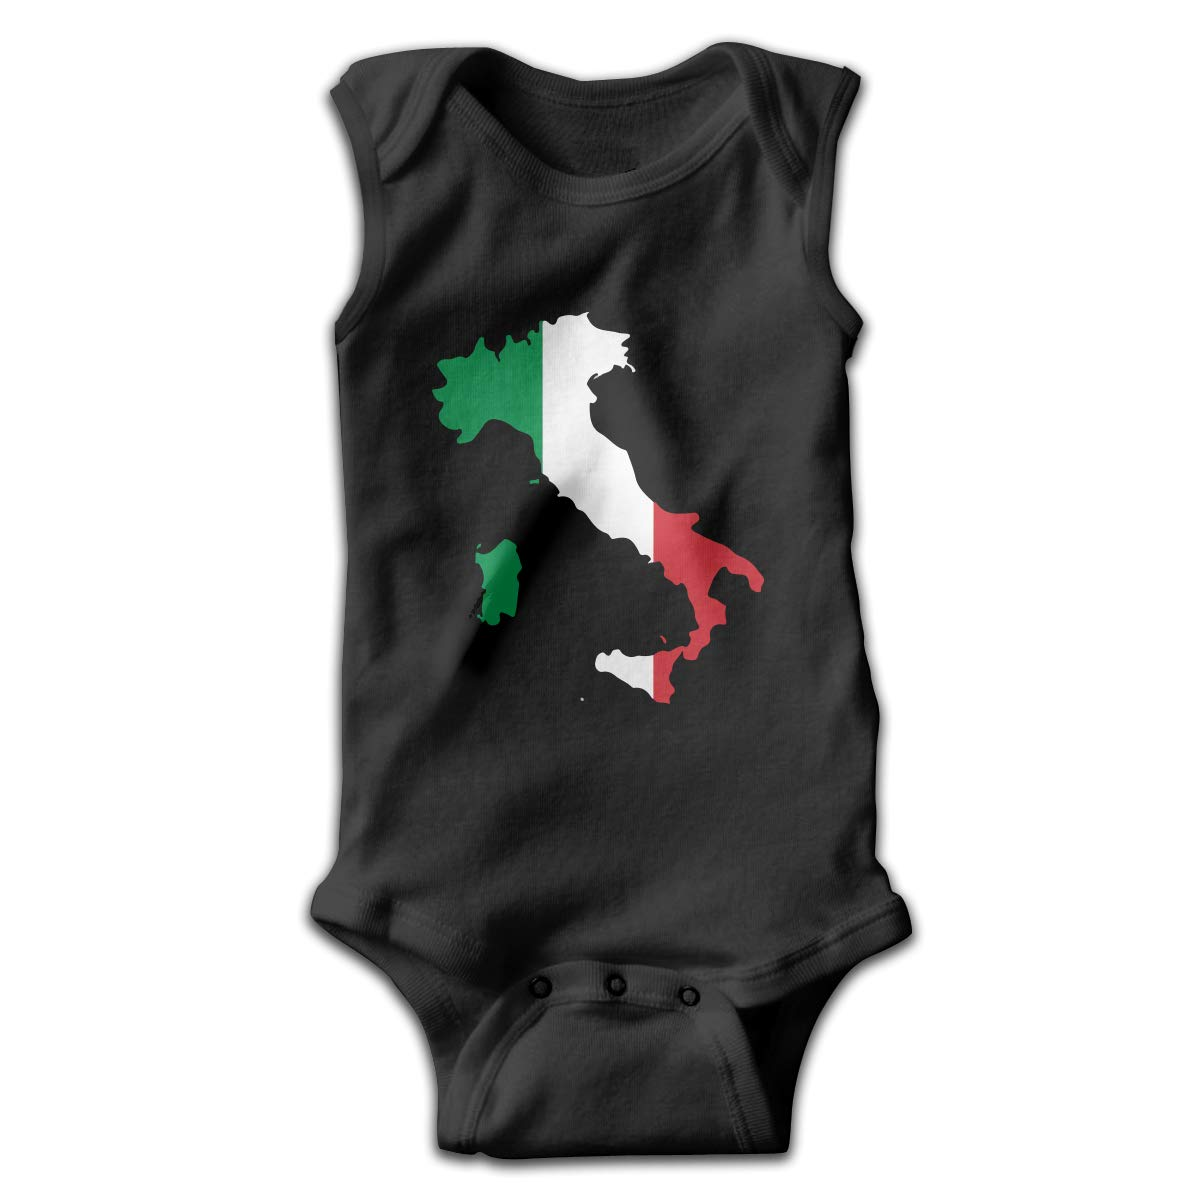 LJDF71@W Newborn Infant Babys Italia Italy Italian Map Sleeveless Crawling Jumpsuit Rompers Black